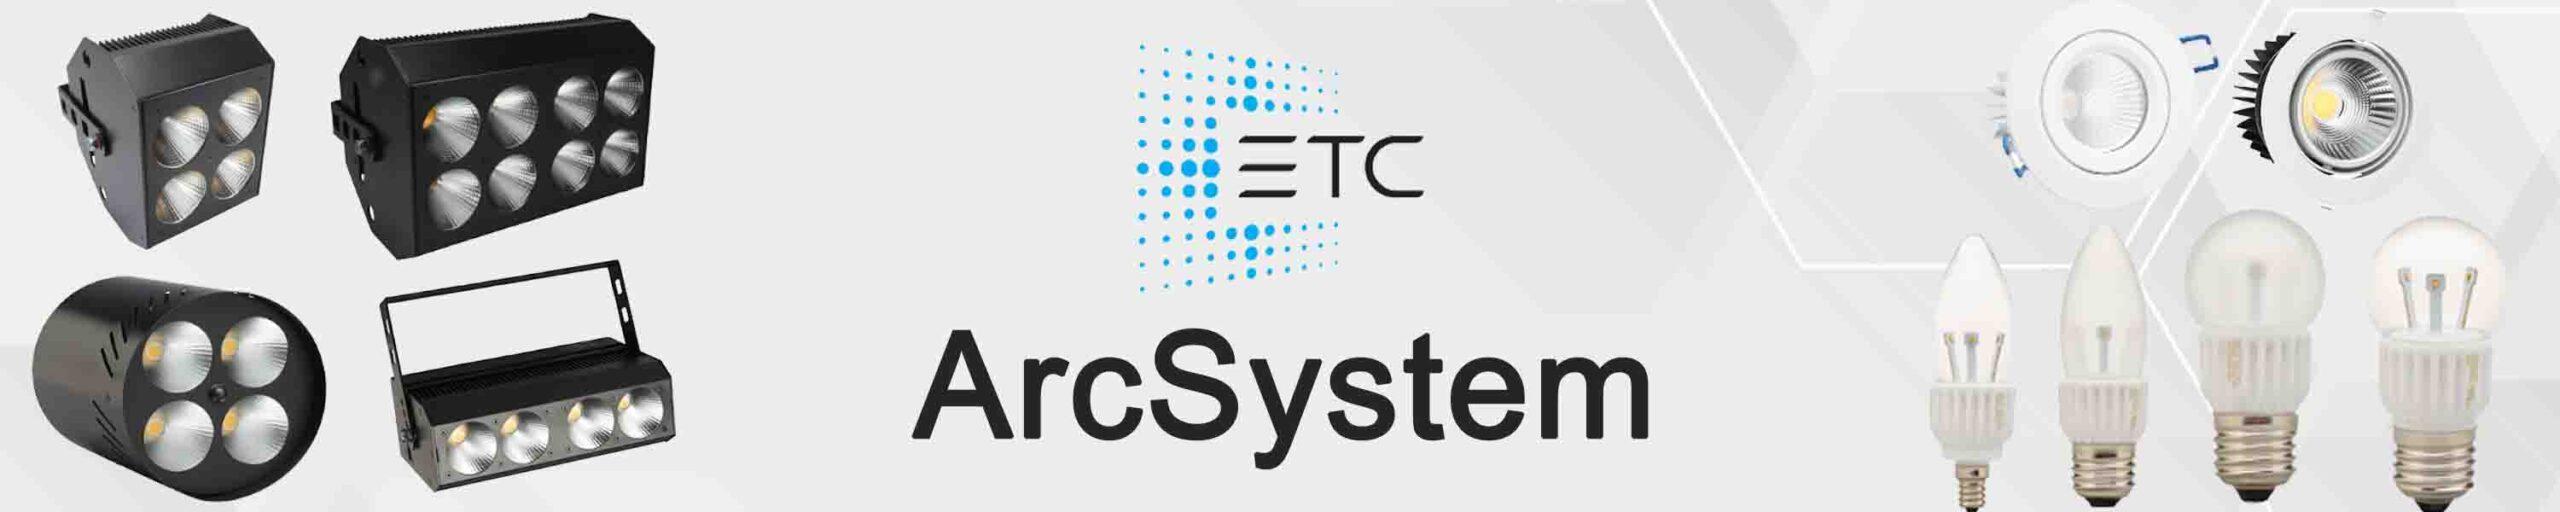 ArcSystem